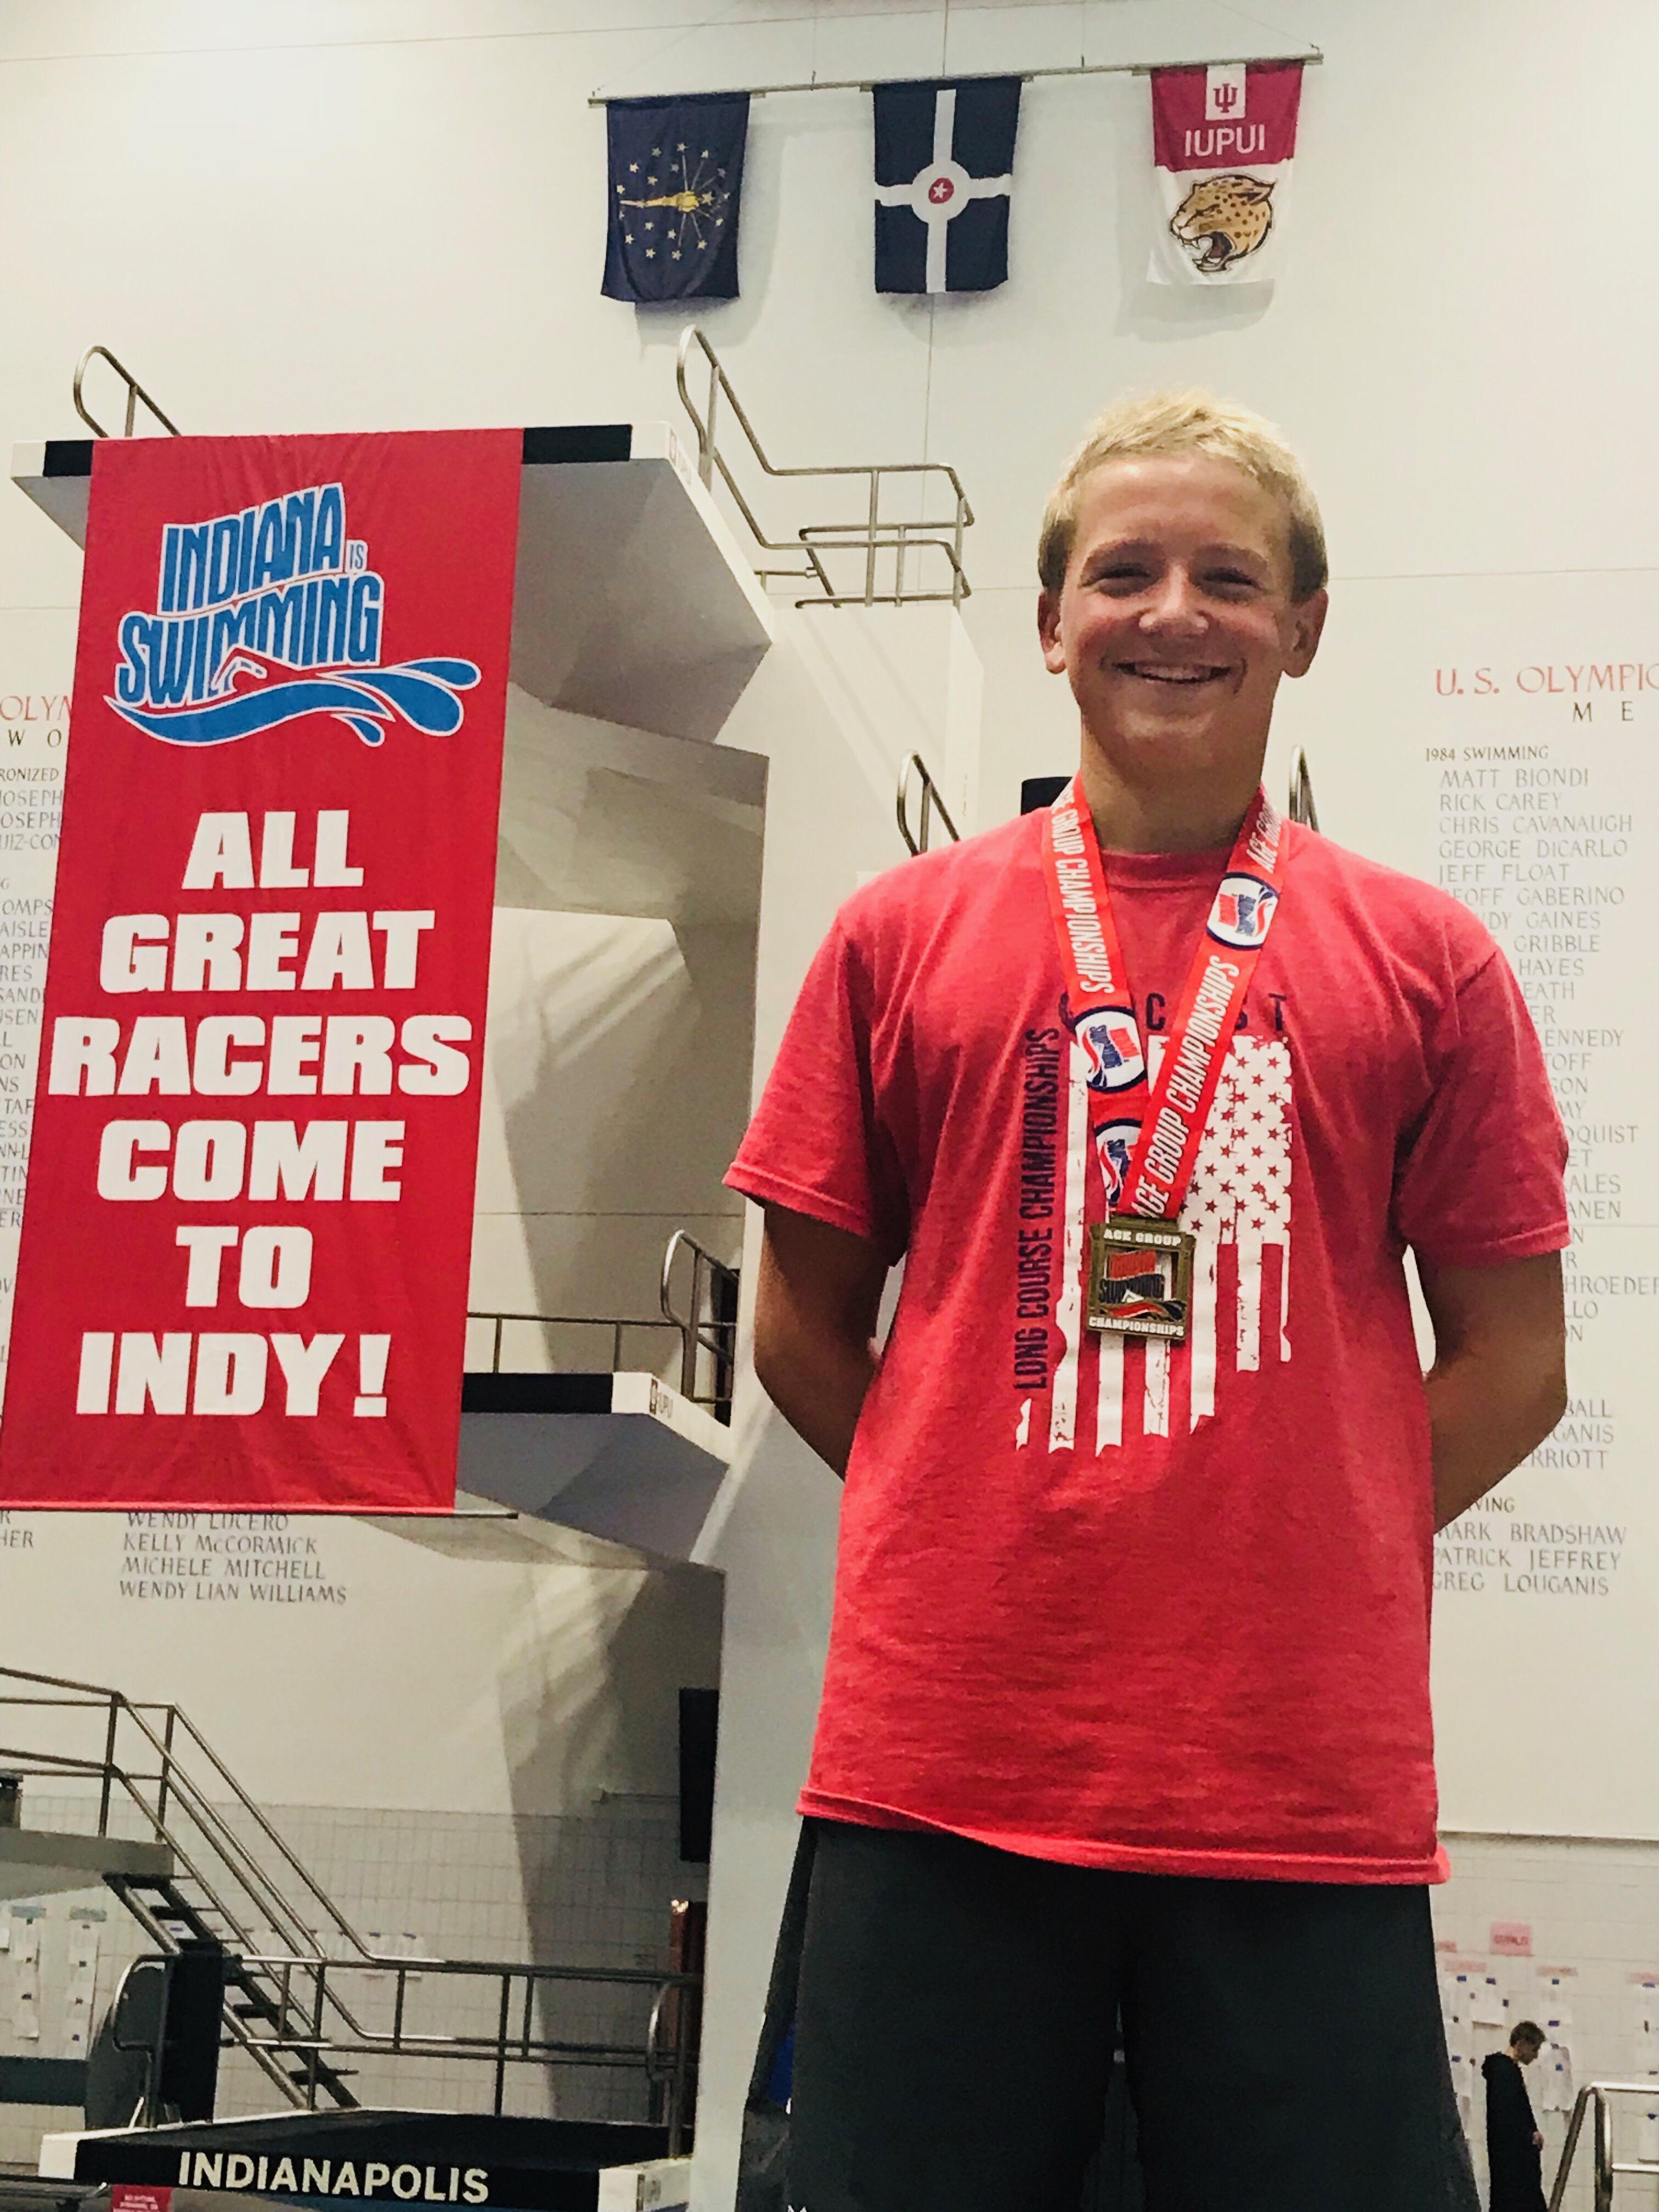 Indiana Swimming 200 Breaststroke Champion